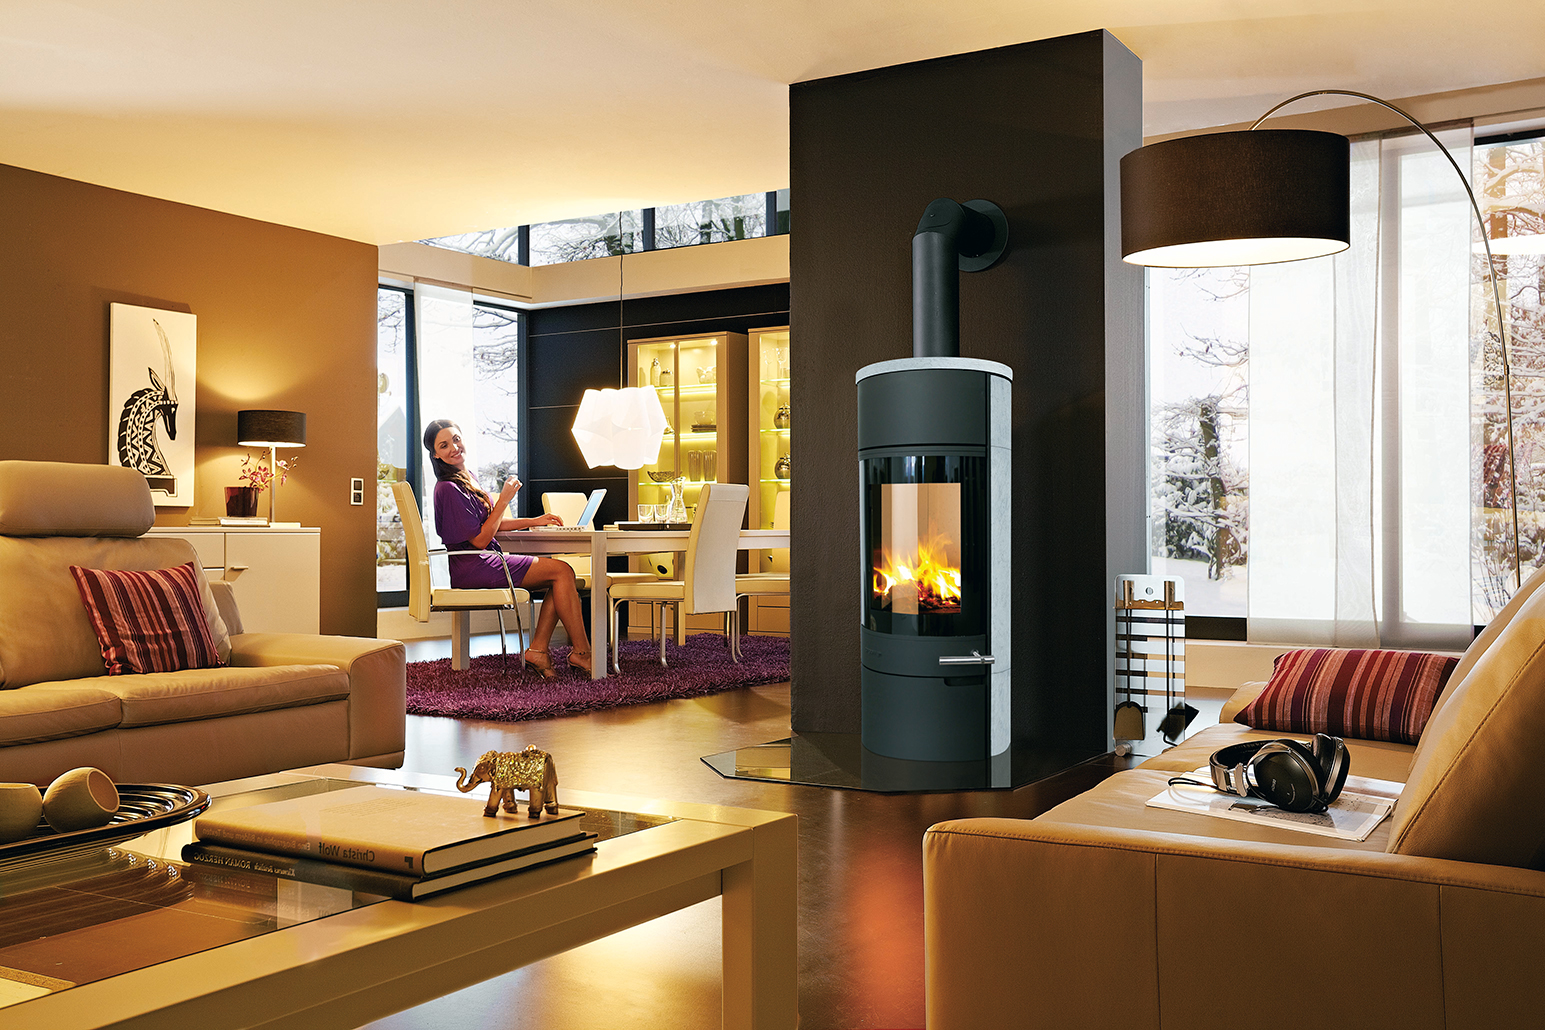 kaminofen solaro 2 natstone von drooff fine art of fire. Black Bedroom Furniture Sets. Home Design Ideas